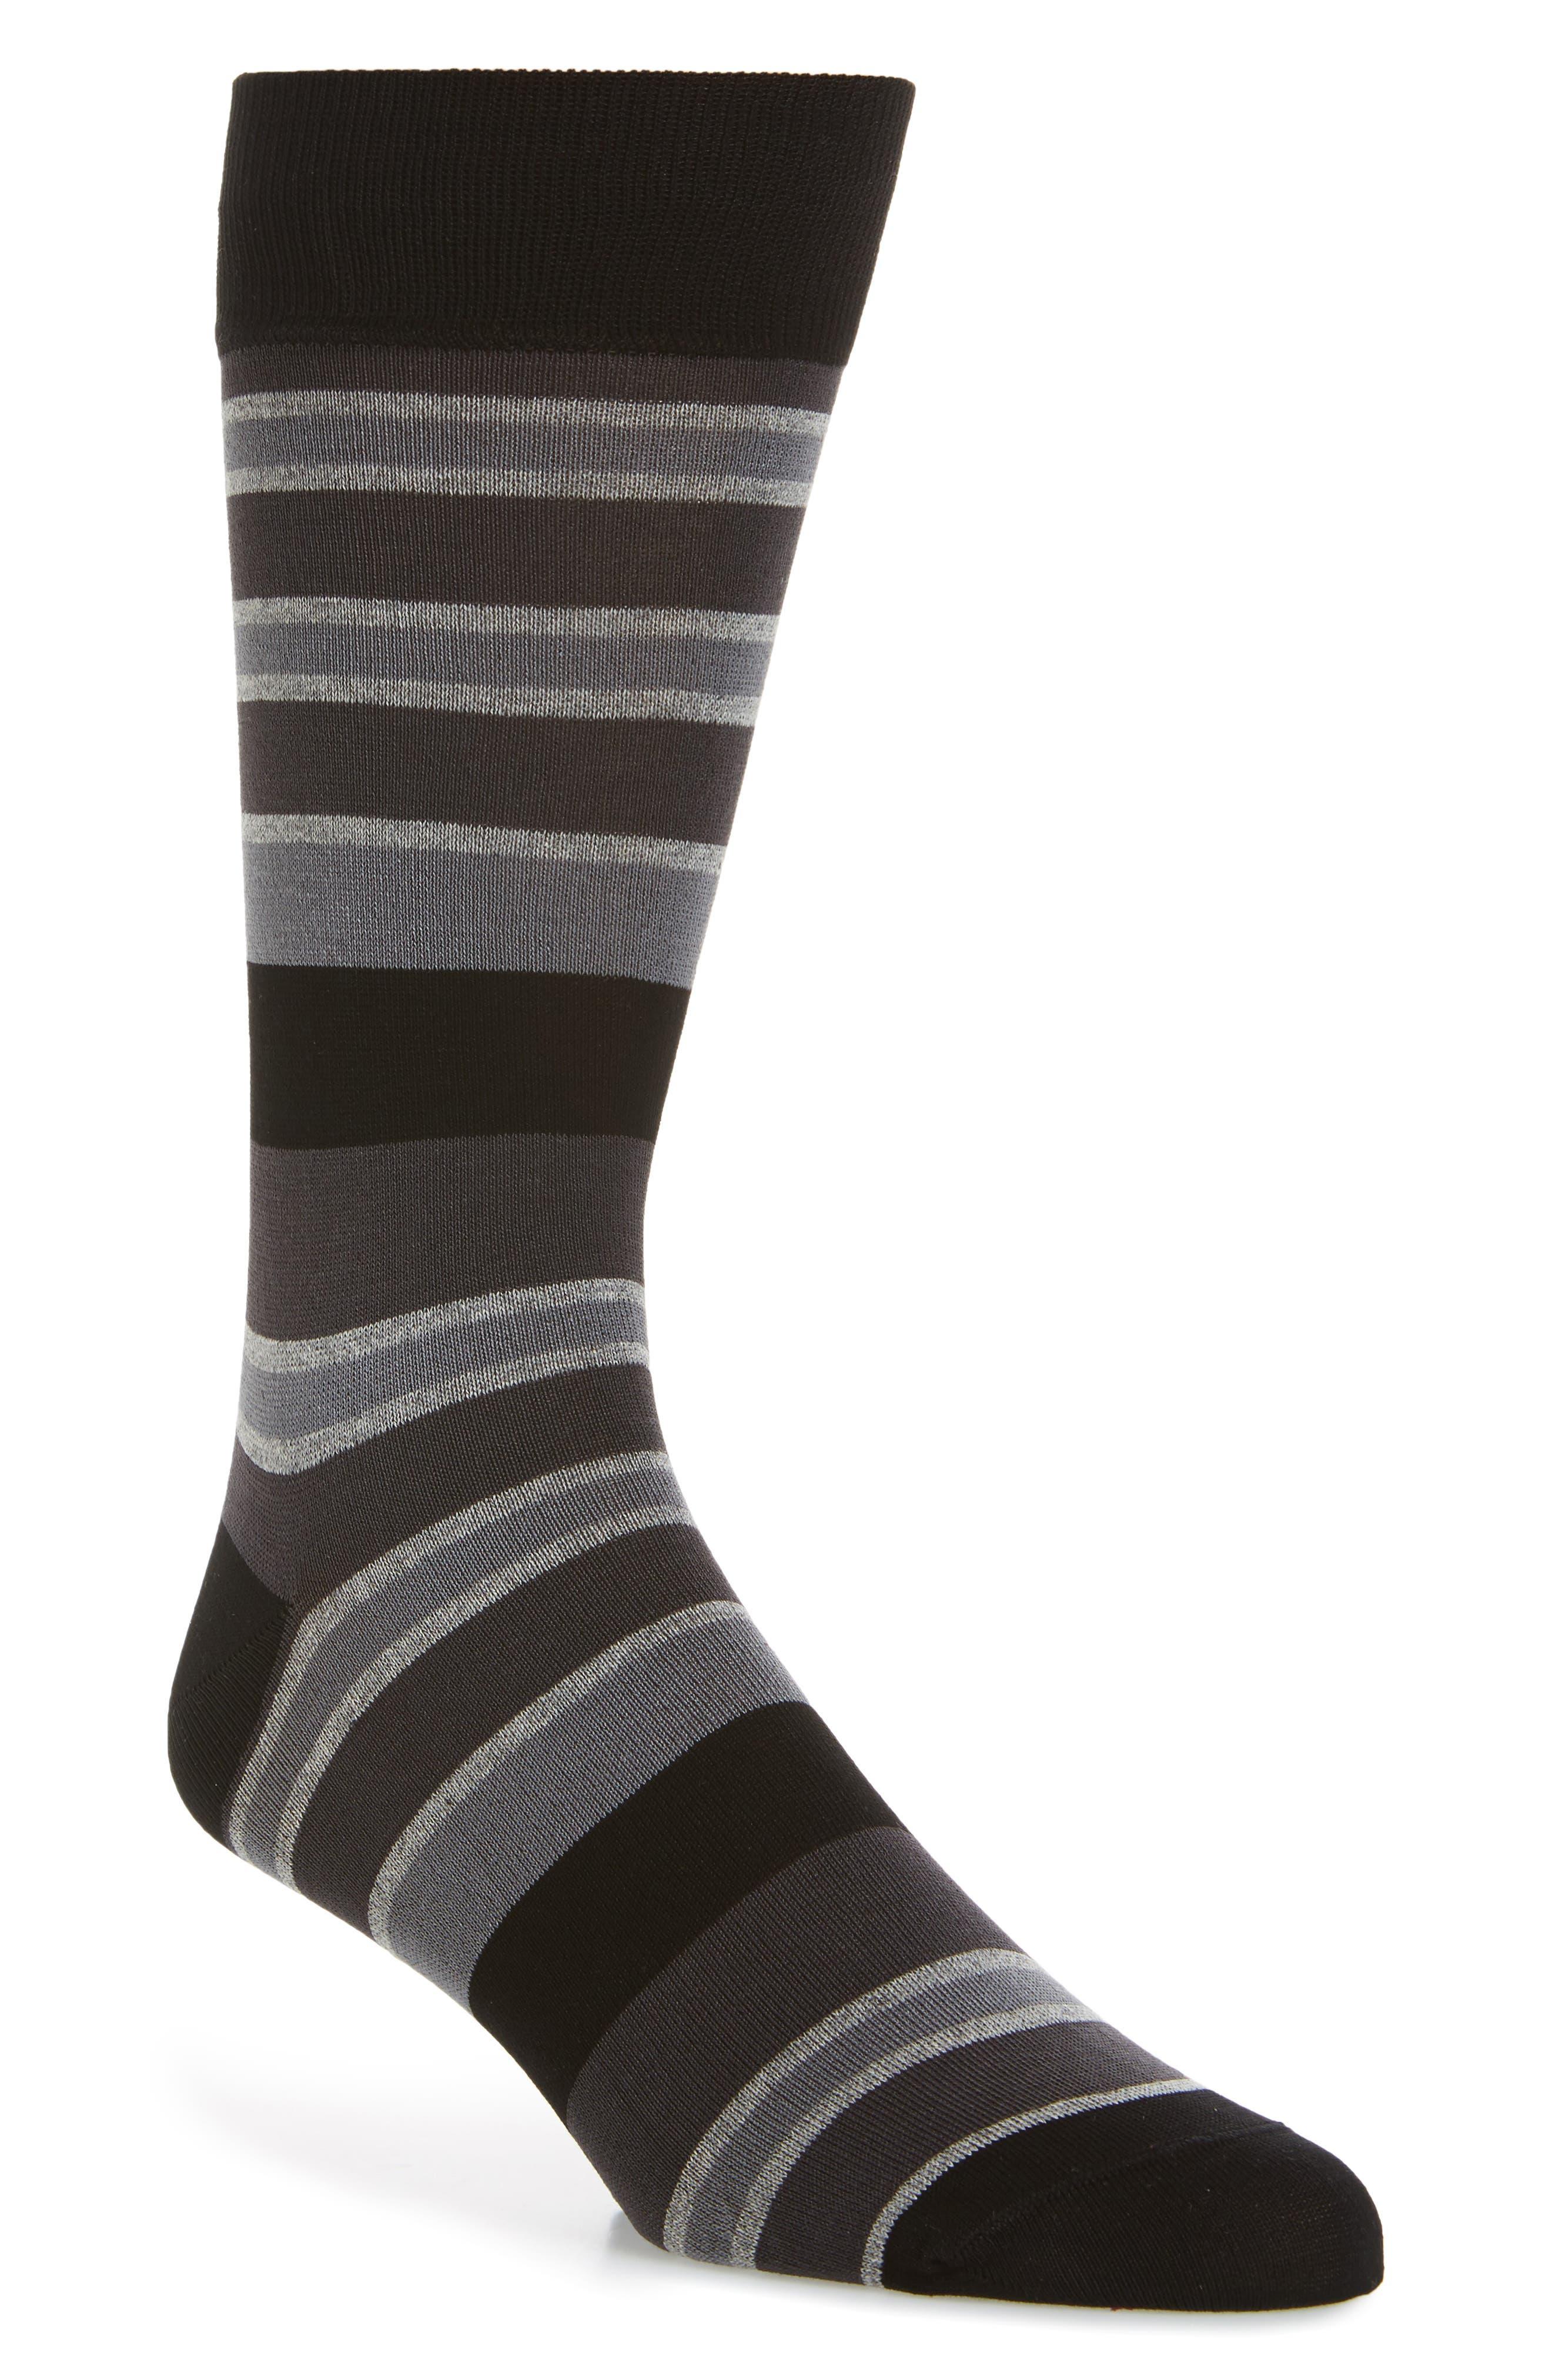 Stripe Mercerized Cotton Blend Socks,                         Main,                         color, Charcoal